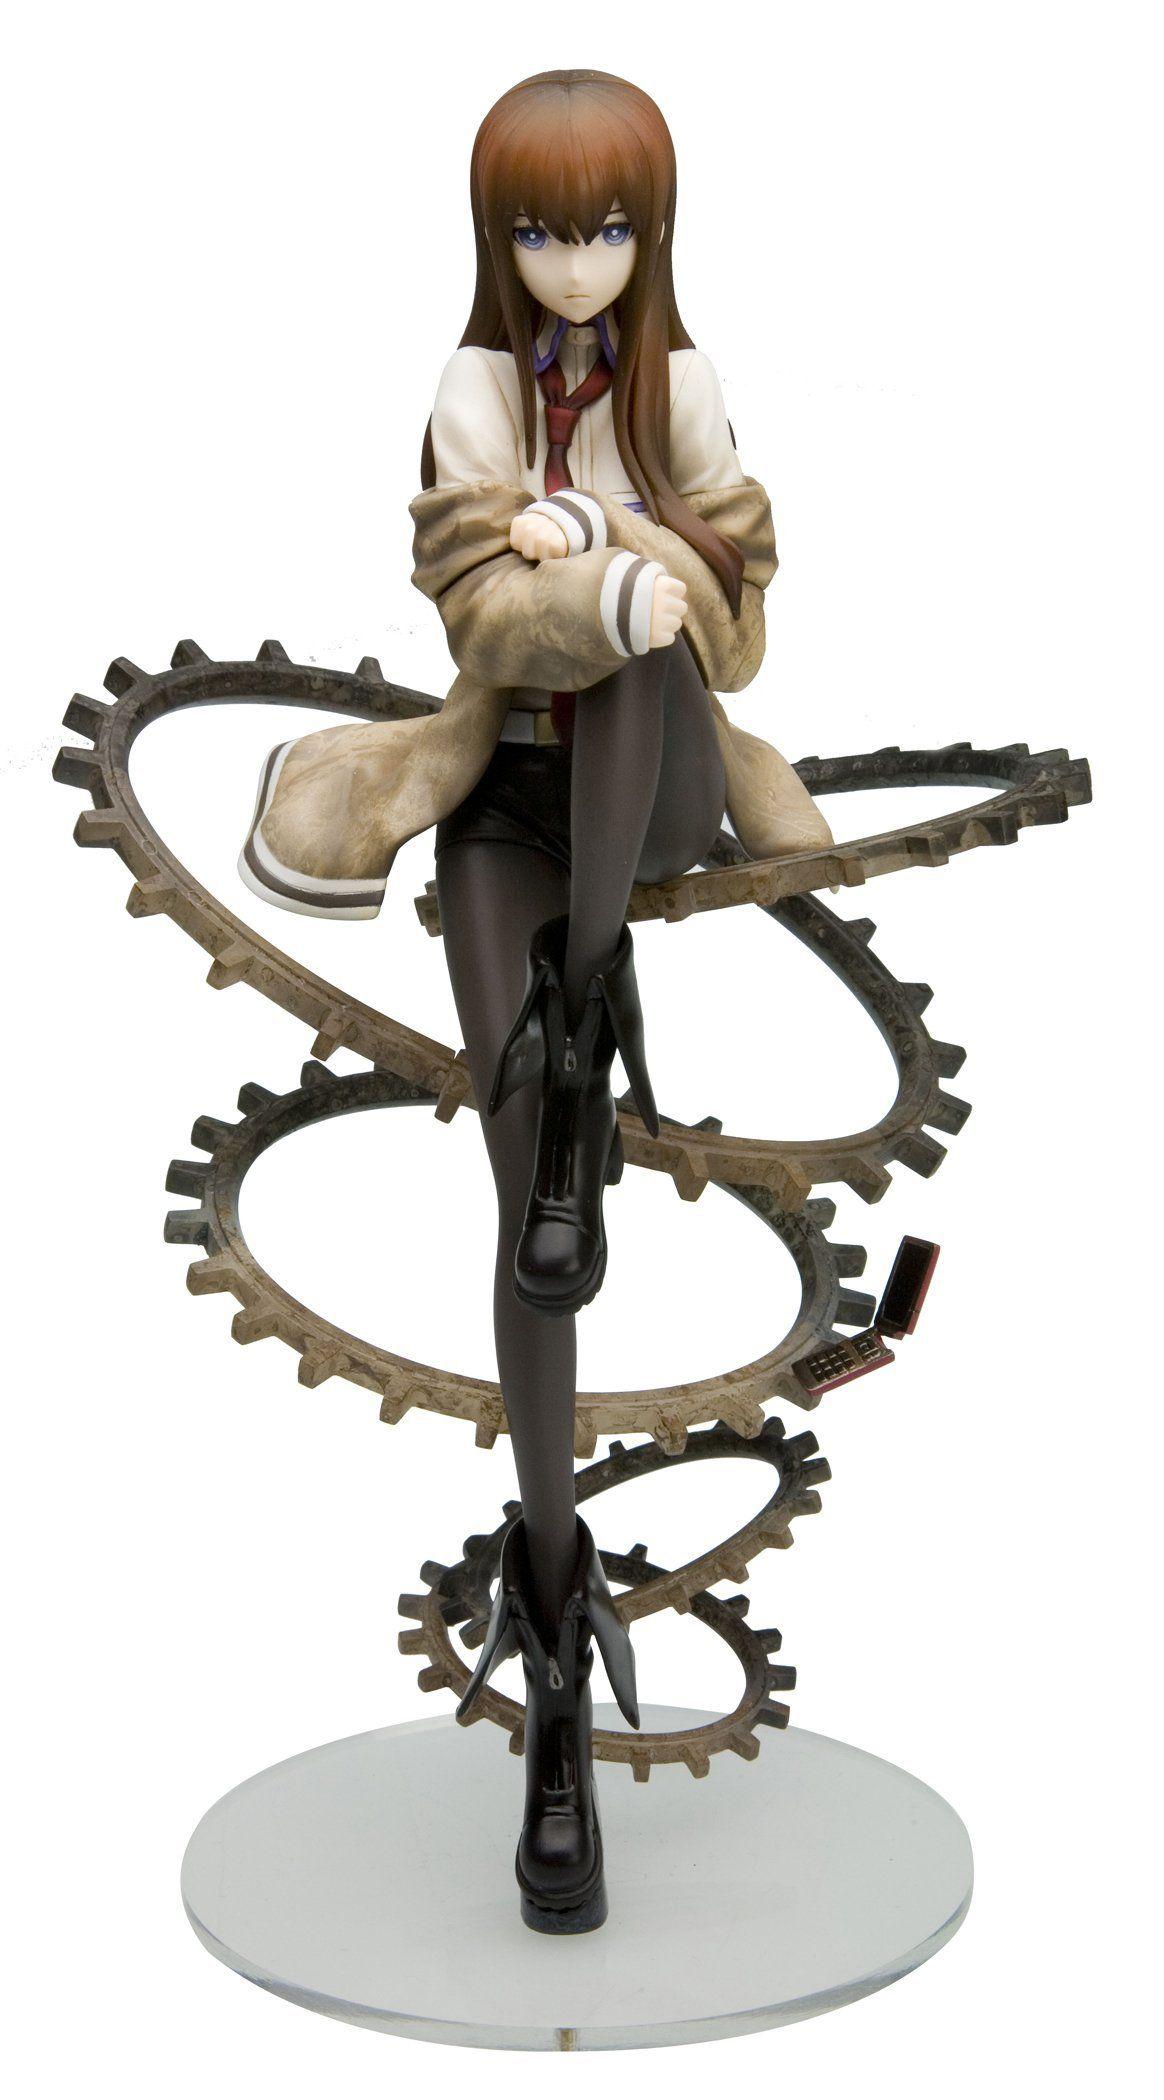 1//4 Scale PVC Figure Figurine No Box Anime STEINS;GATE Kurisu Makise Bunny Ver